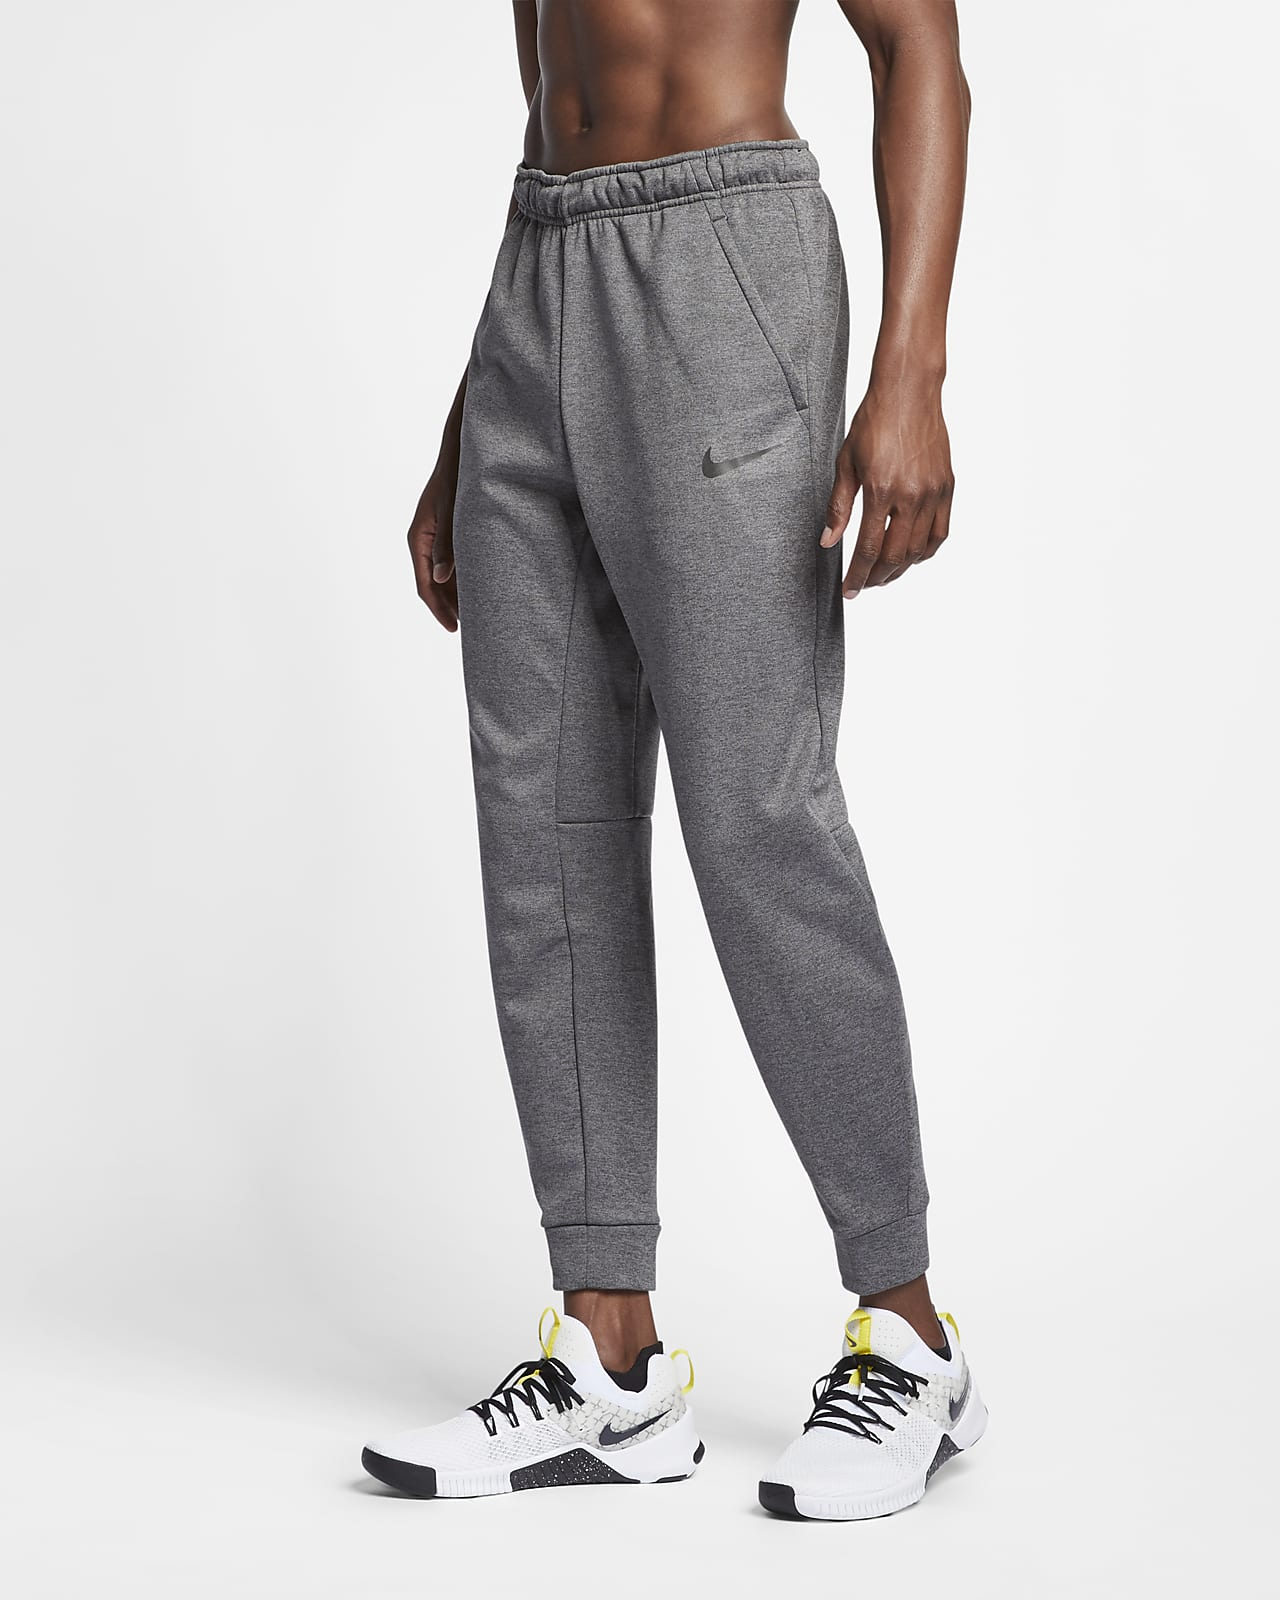 Pantaloni da training affusolati Nike Therma-FIT - Uomo